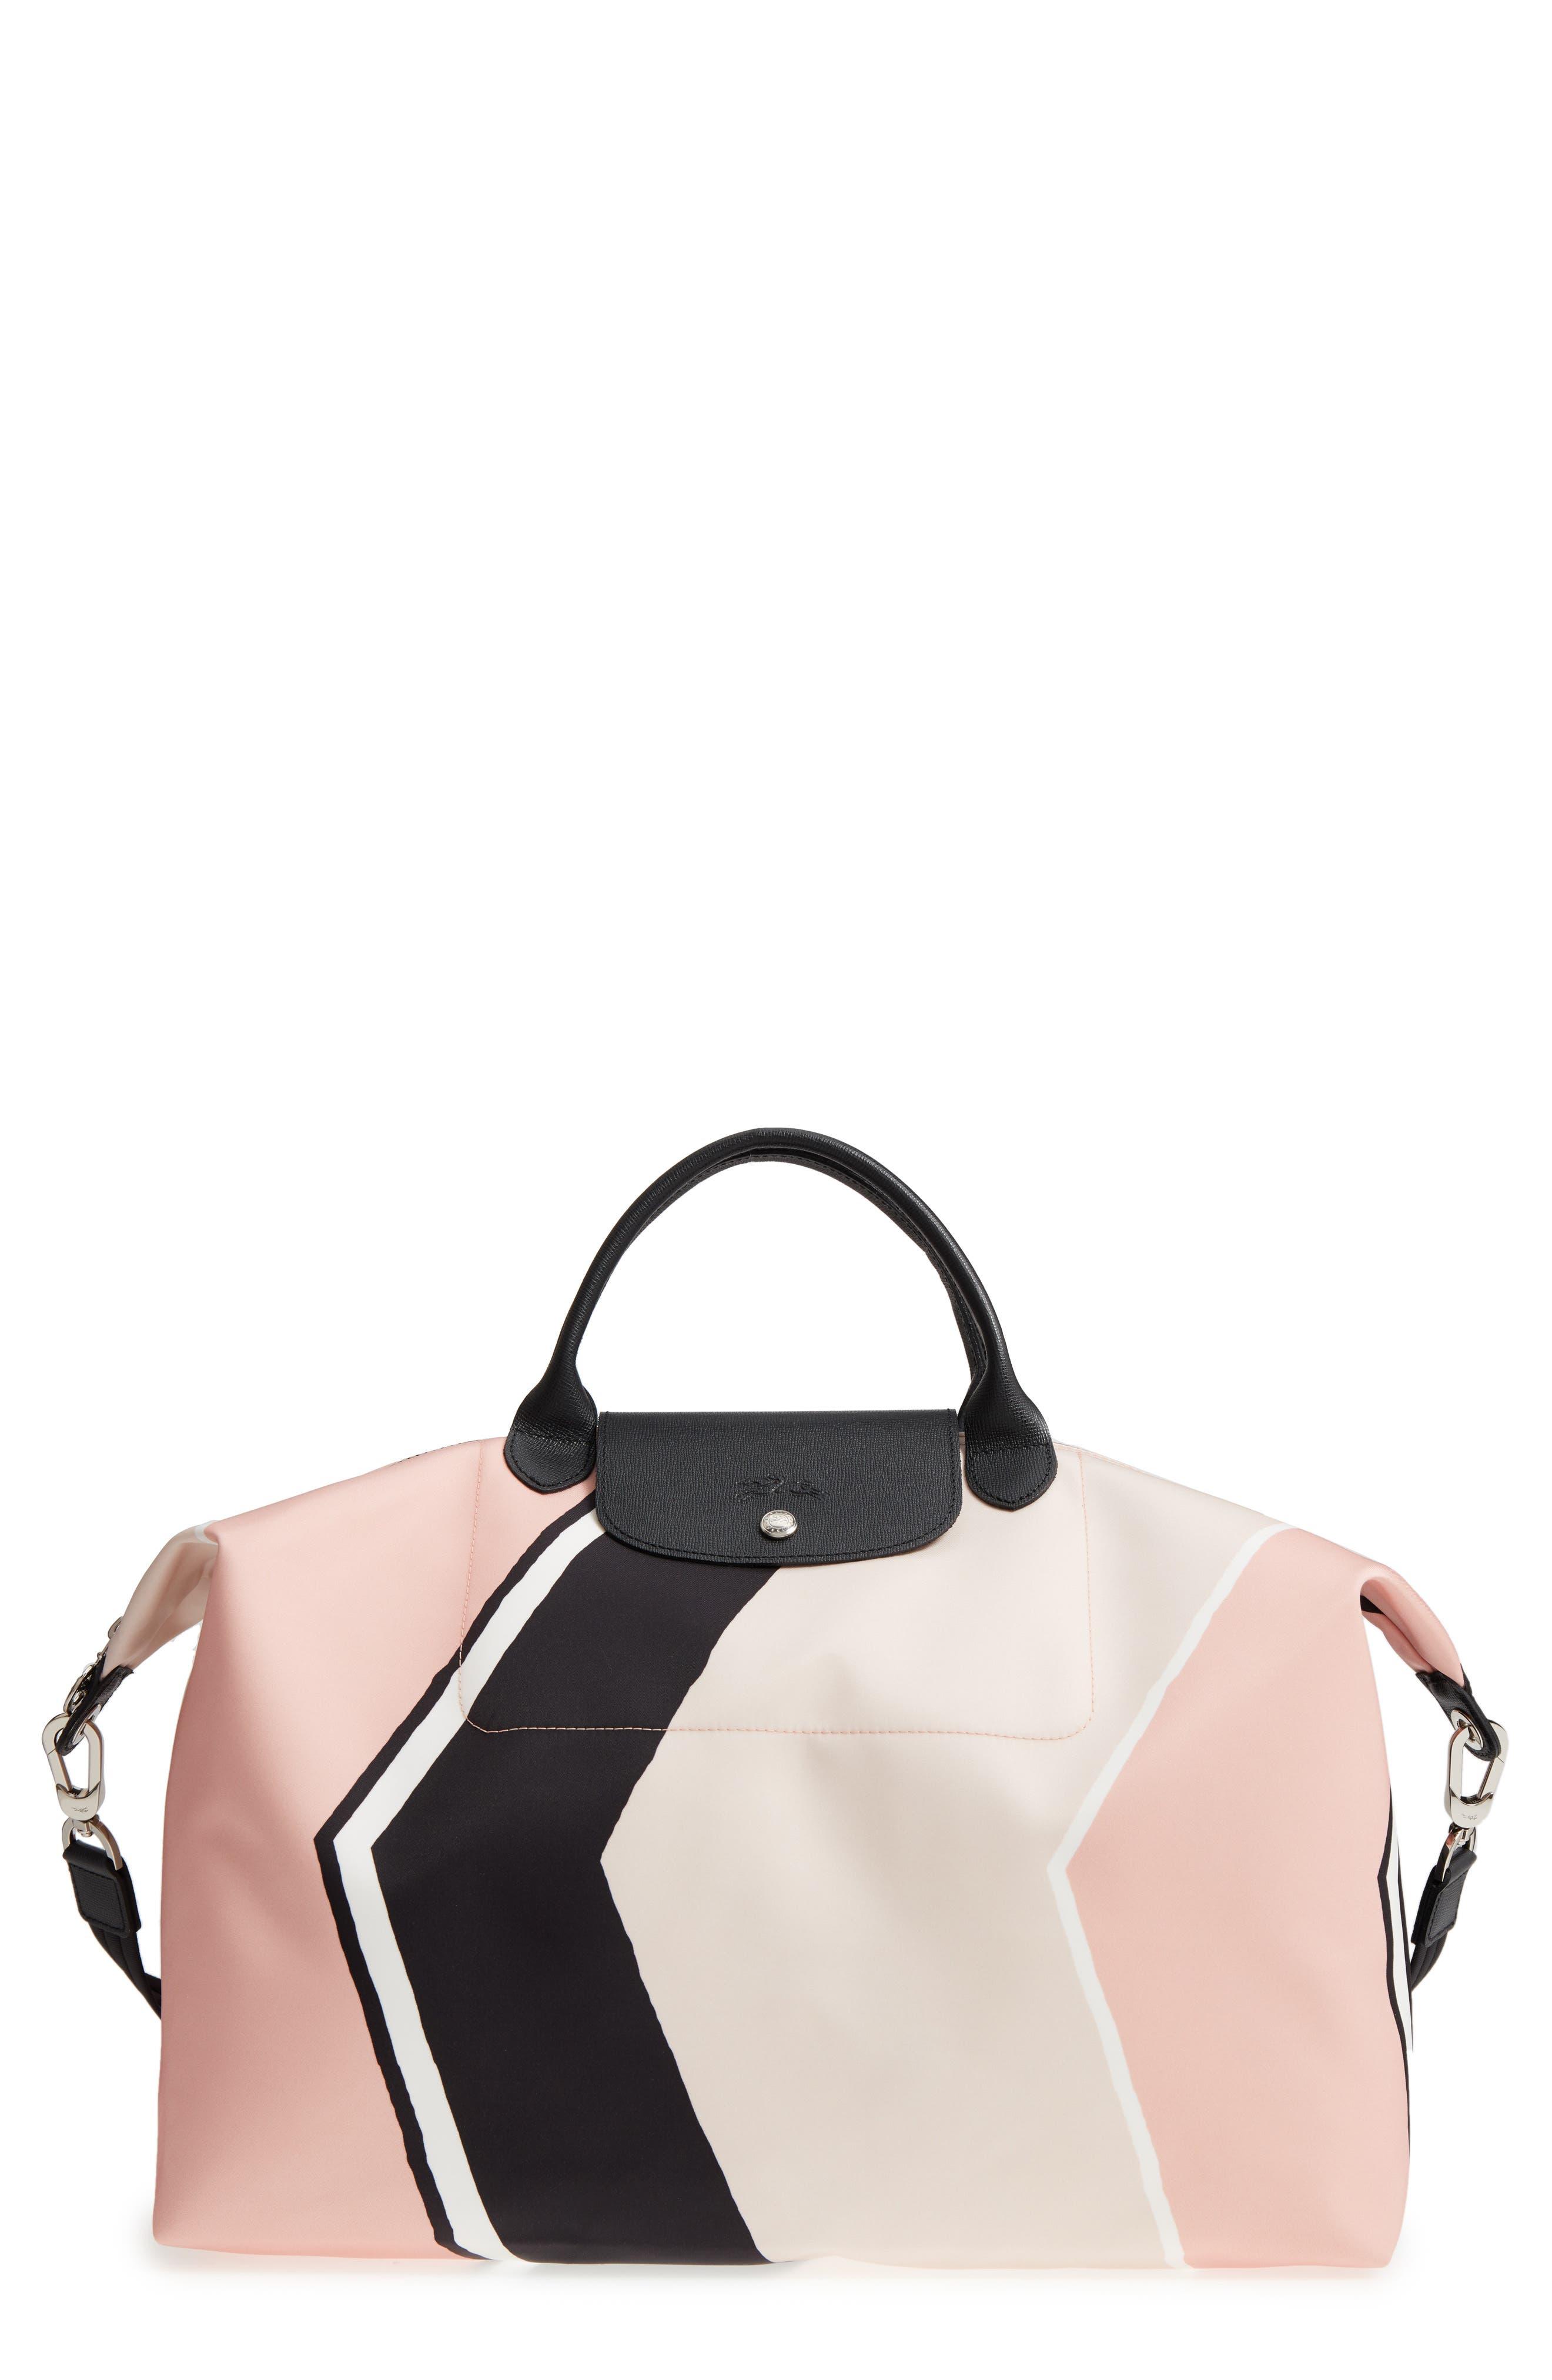 Longchamp Le Pliage Neo Travel Bag